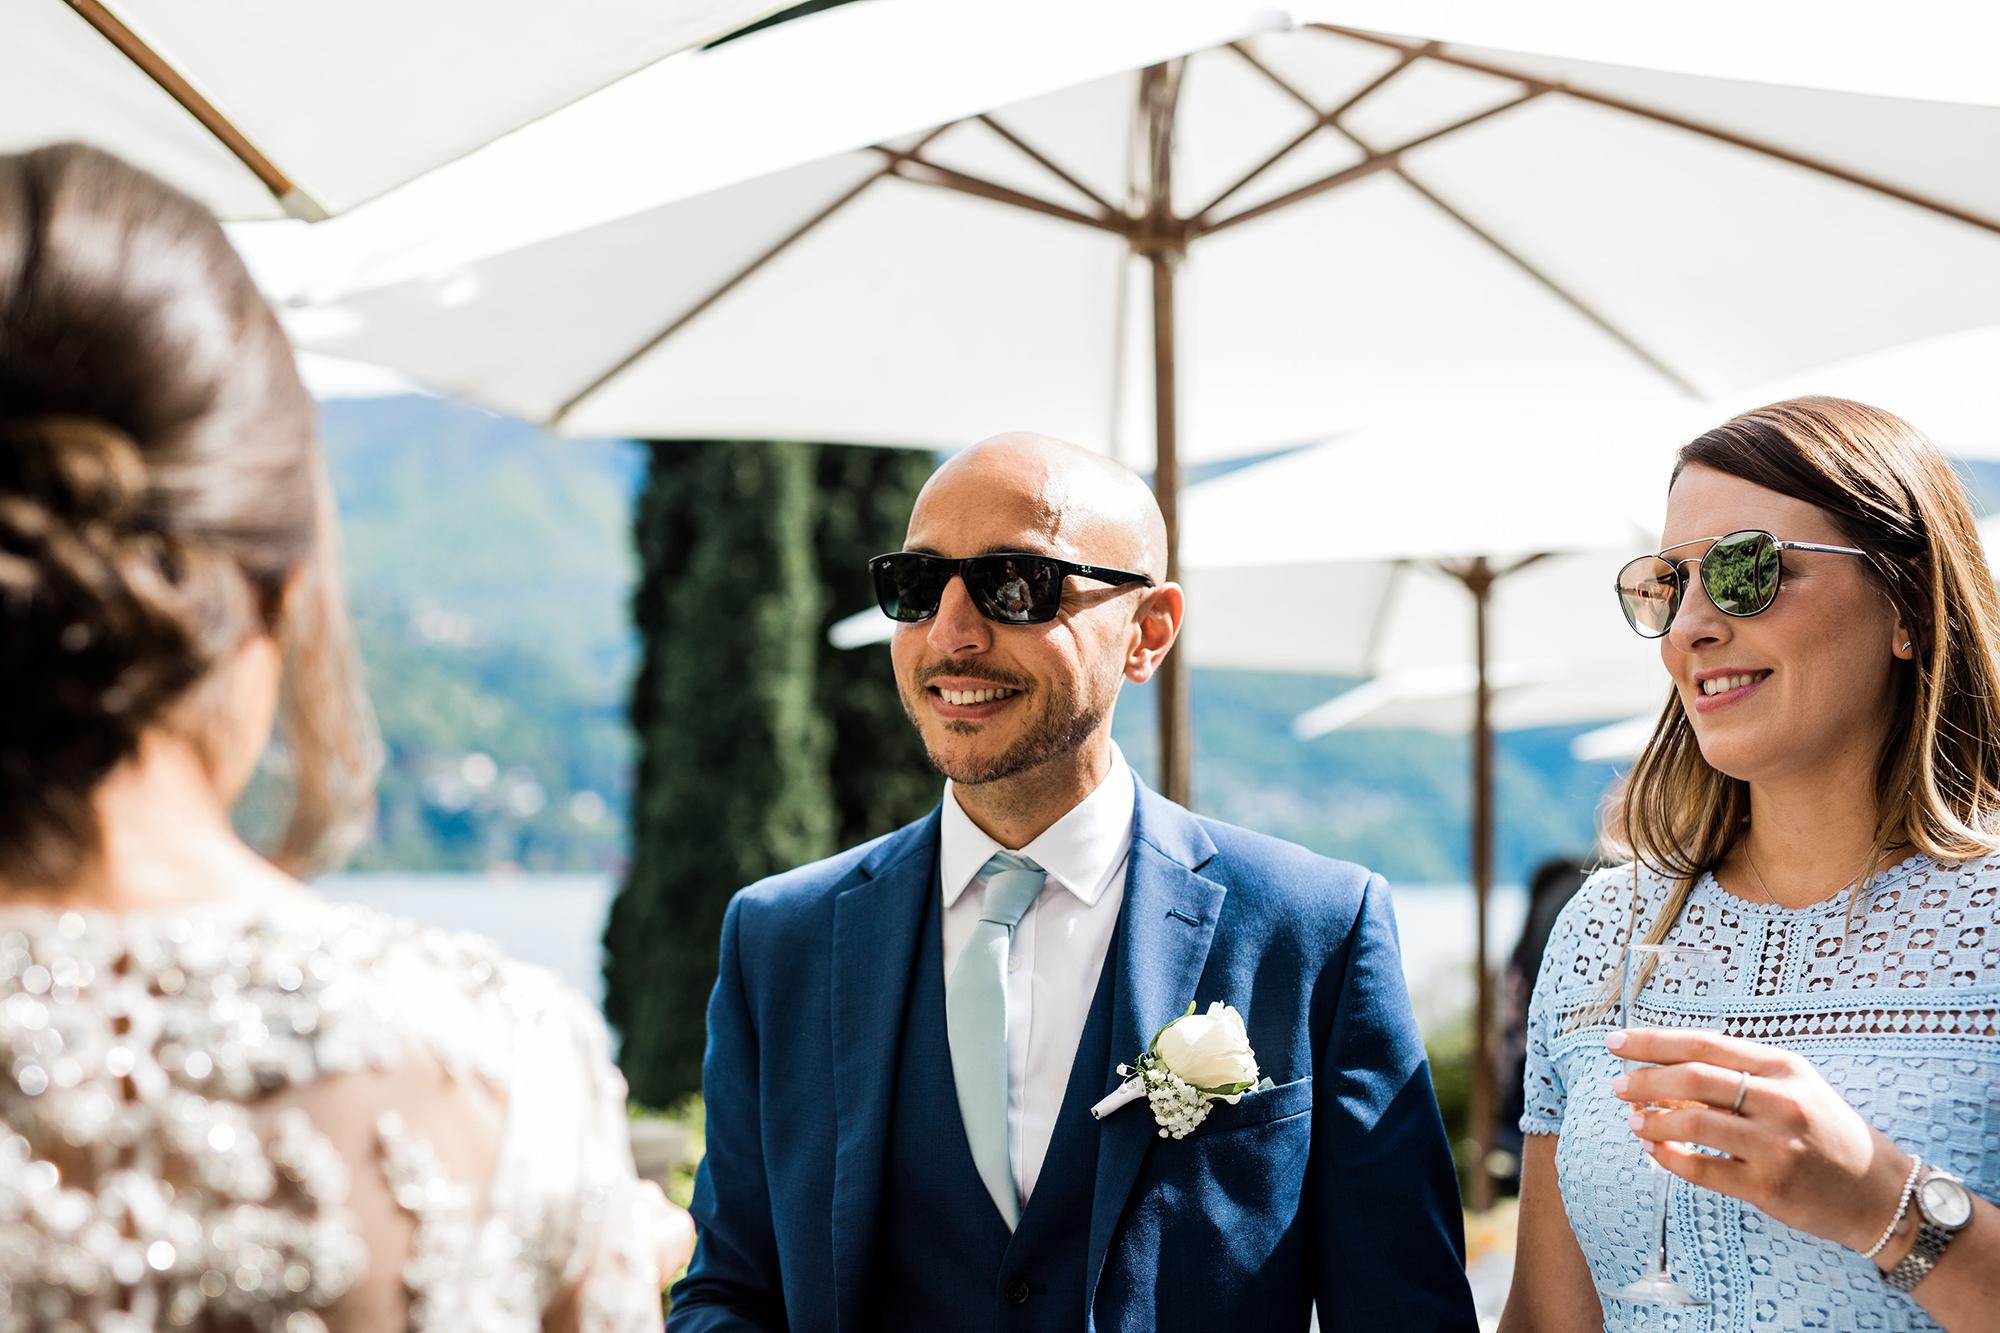 Your_Wedding_Day_293.jpg